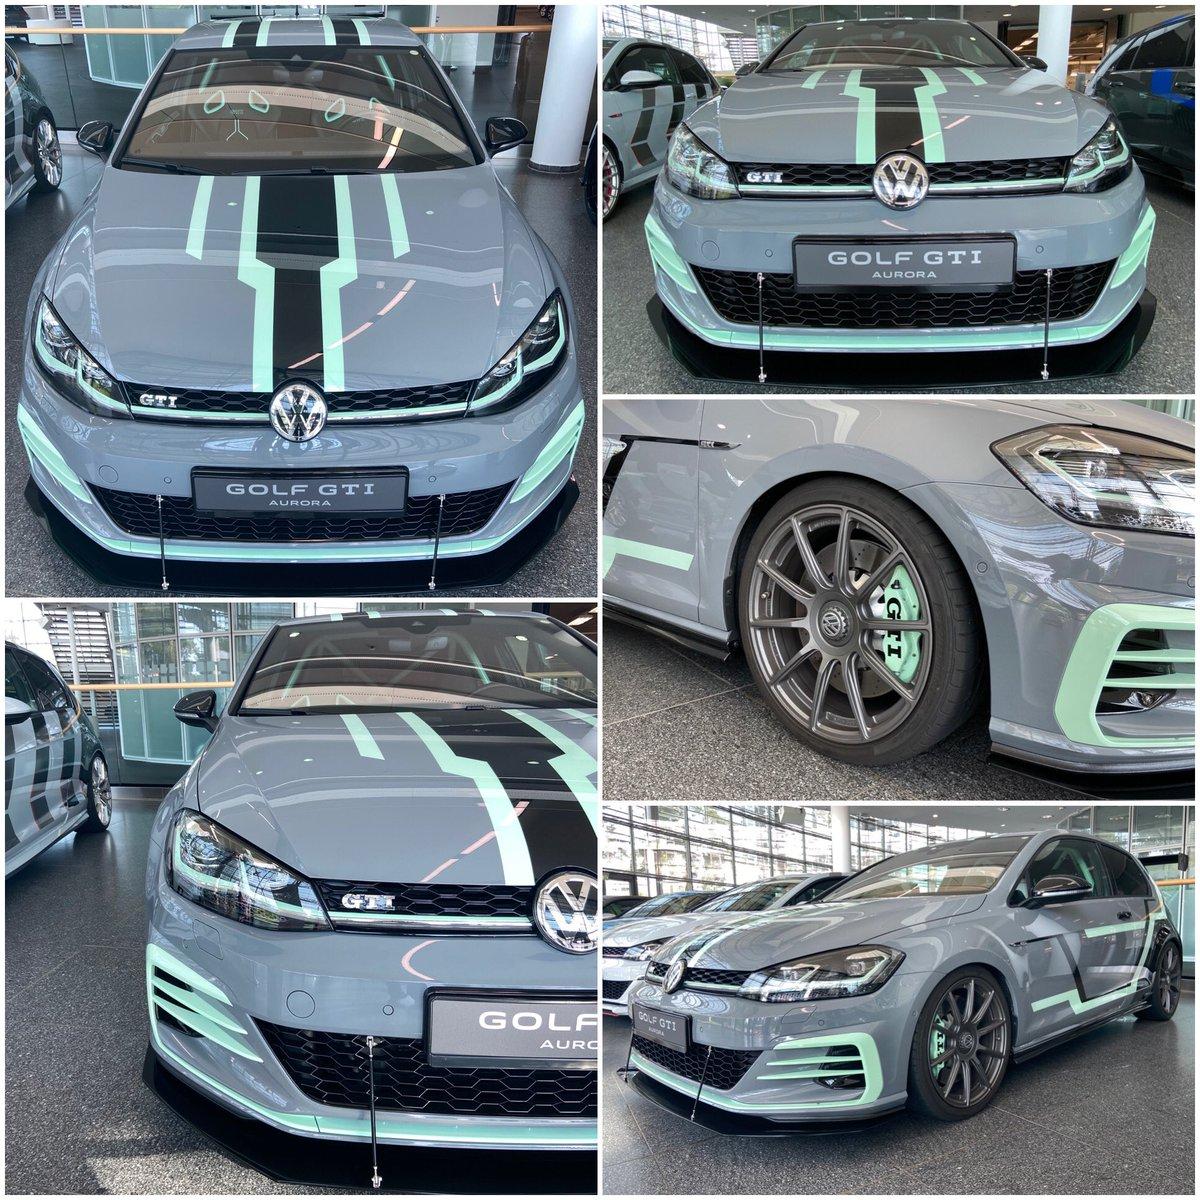 VW Golf GTI Aurora (2019)  #vw #autostadt #volkswagen #golf #golfgti #wörthersee #golf7 #aurora #golfr #mk7 #vwgolf #vwlifestyle #stancenation #volkswagengroup #vwfans #carspotting #caroftheday #carphotography #germancars #itswhitenoise #unikat - https://t.co/CZw44A4Qzv https://t.co/hX0iShTT3k